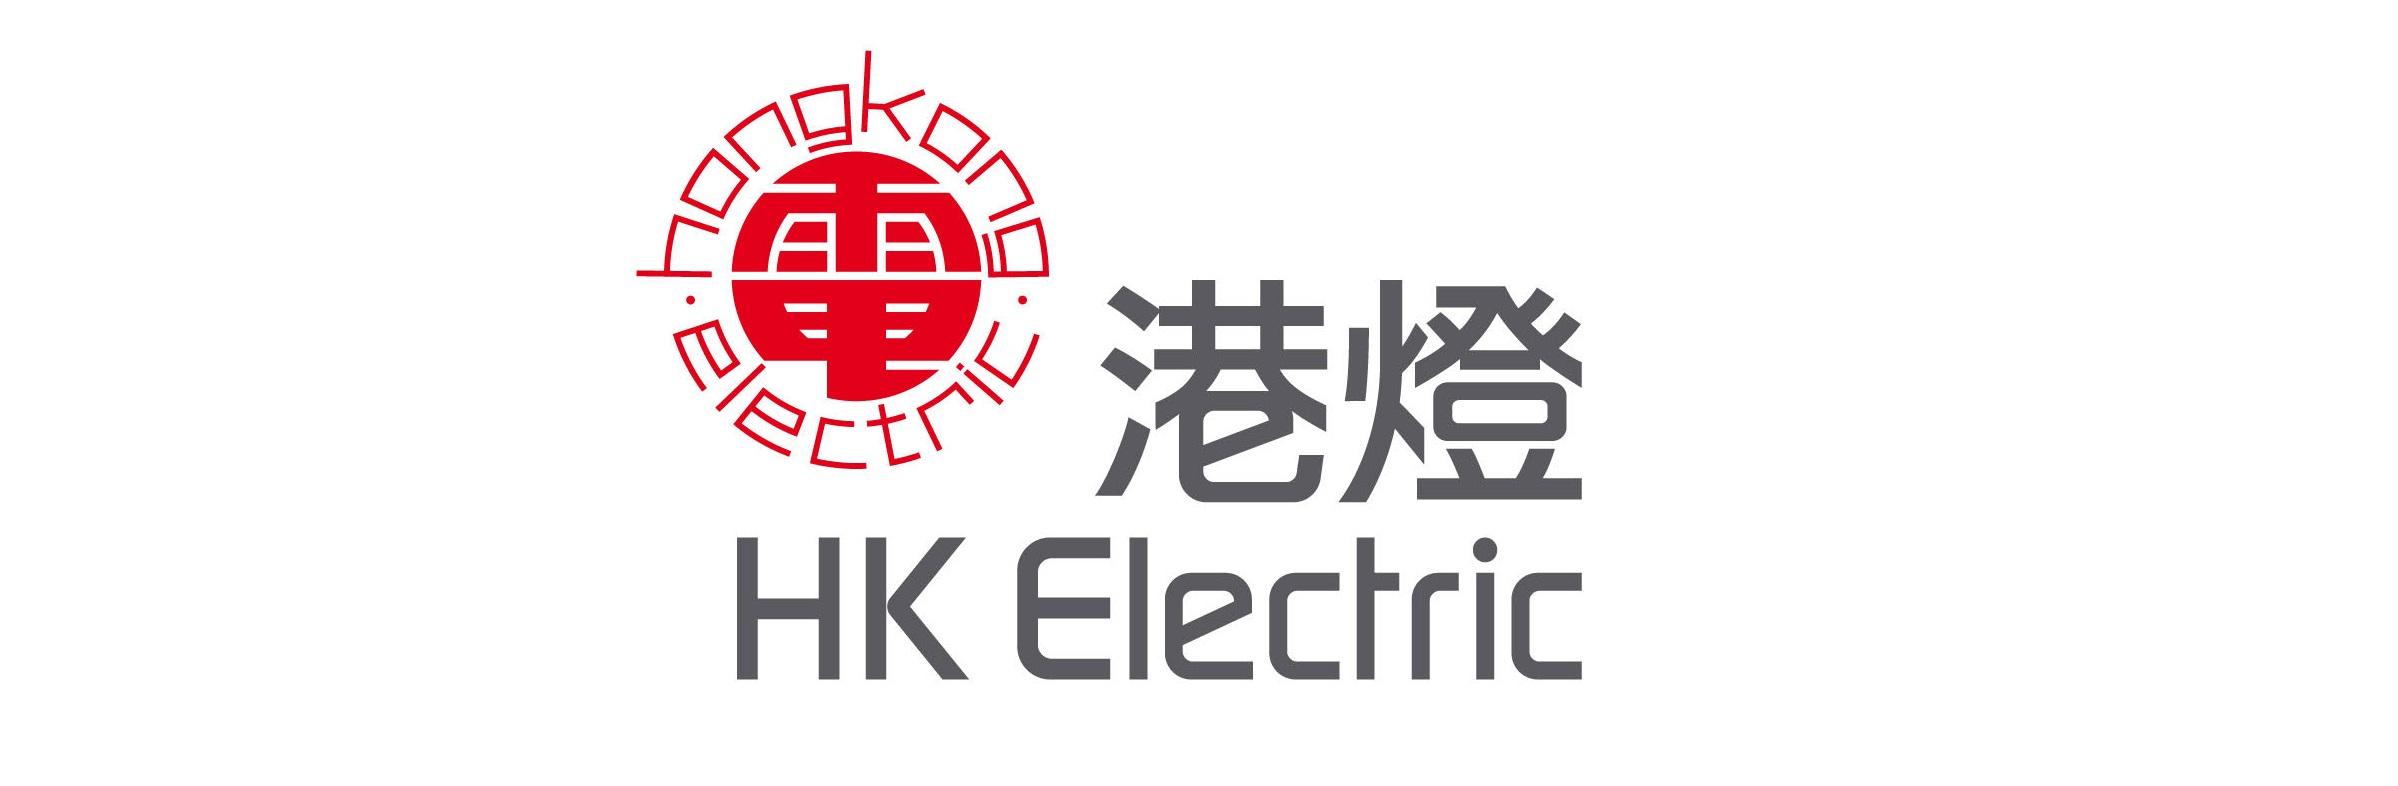 The Hongkong Electric Co., Ltd.